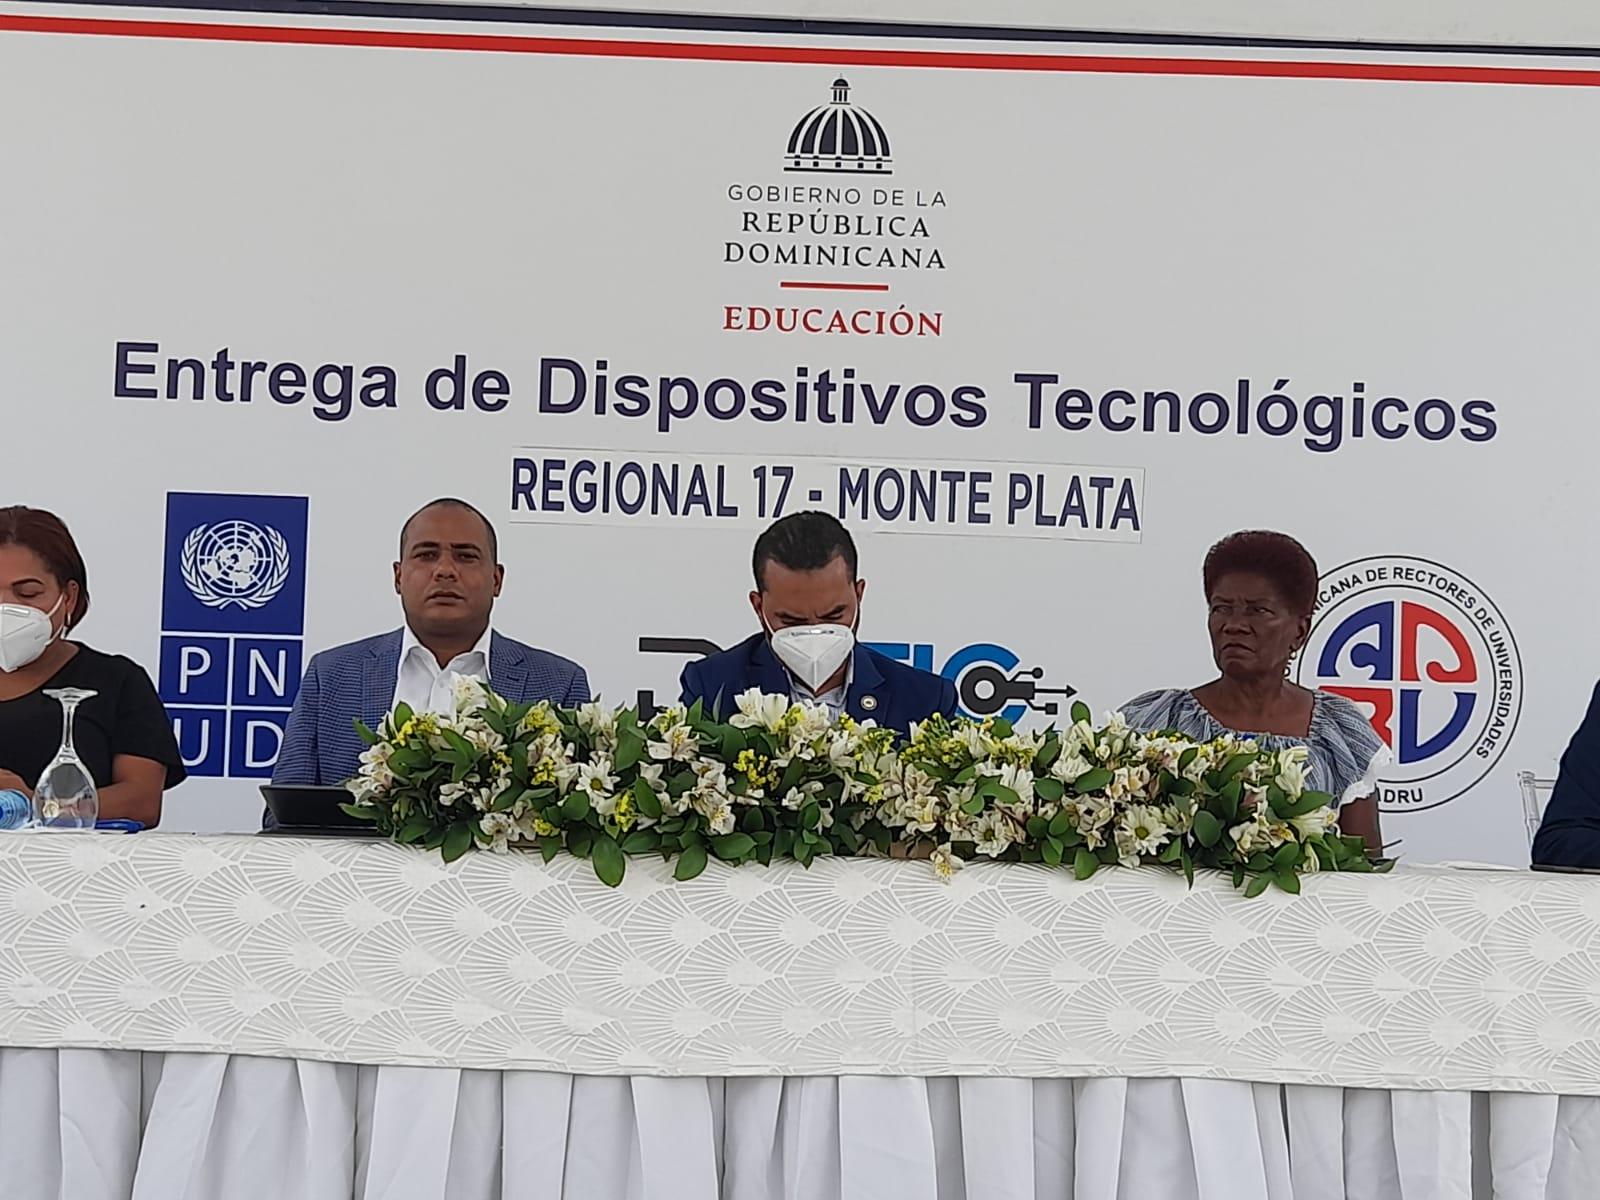 Minerd inicia  entrega de dispositivos tecnológicos en Monte Plata